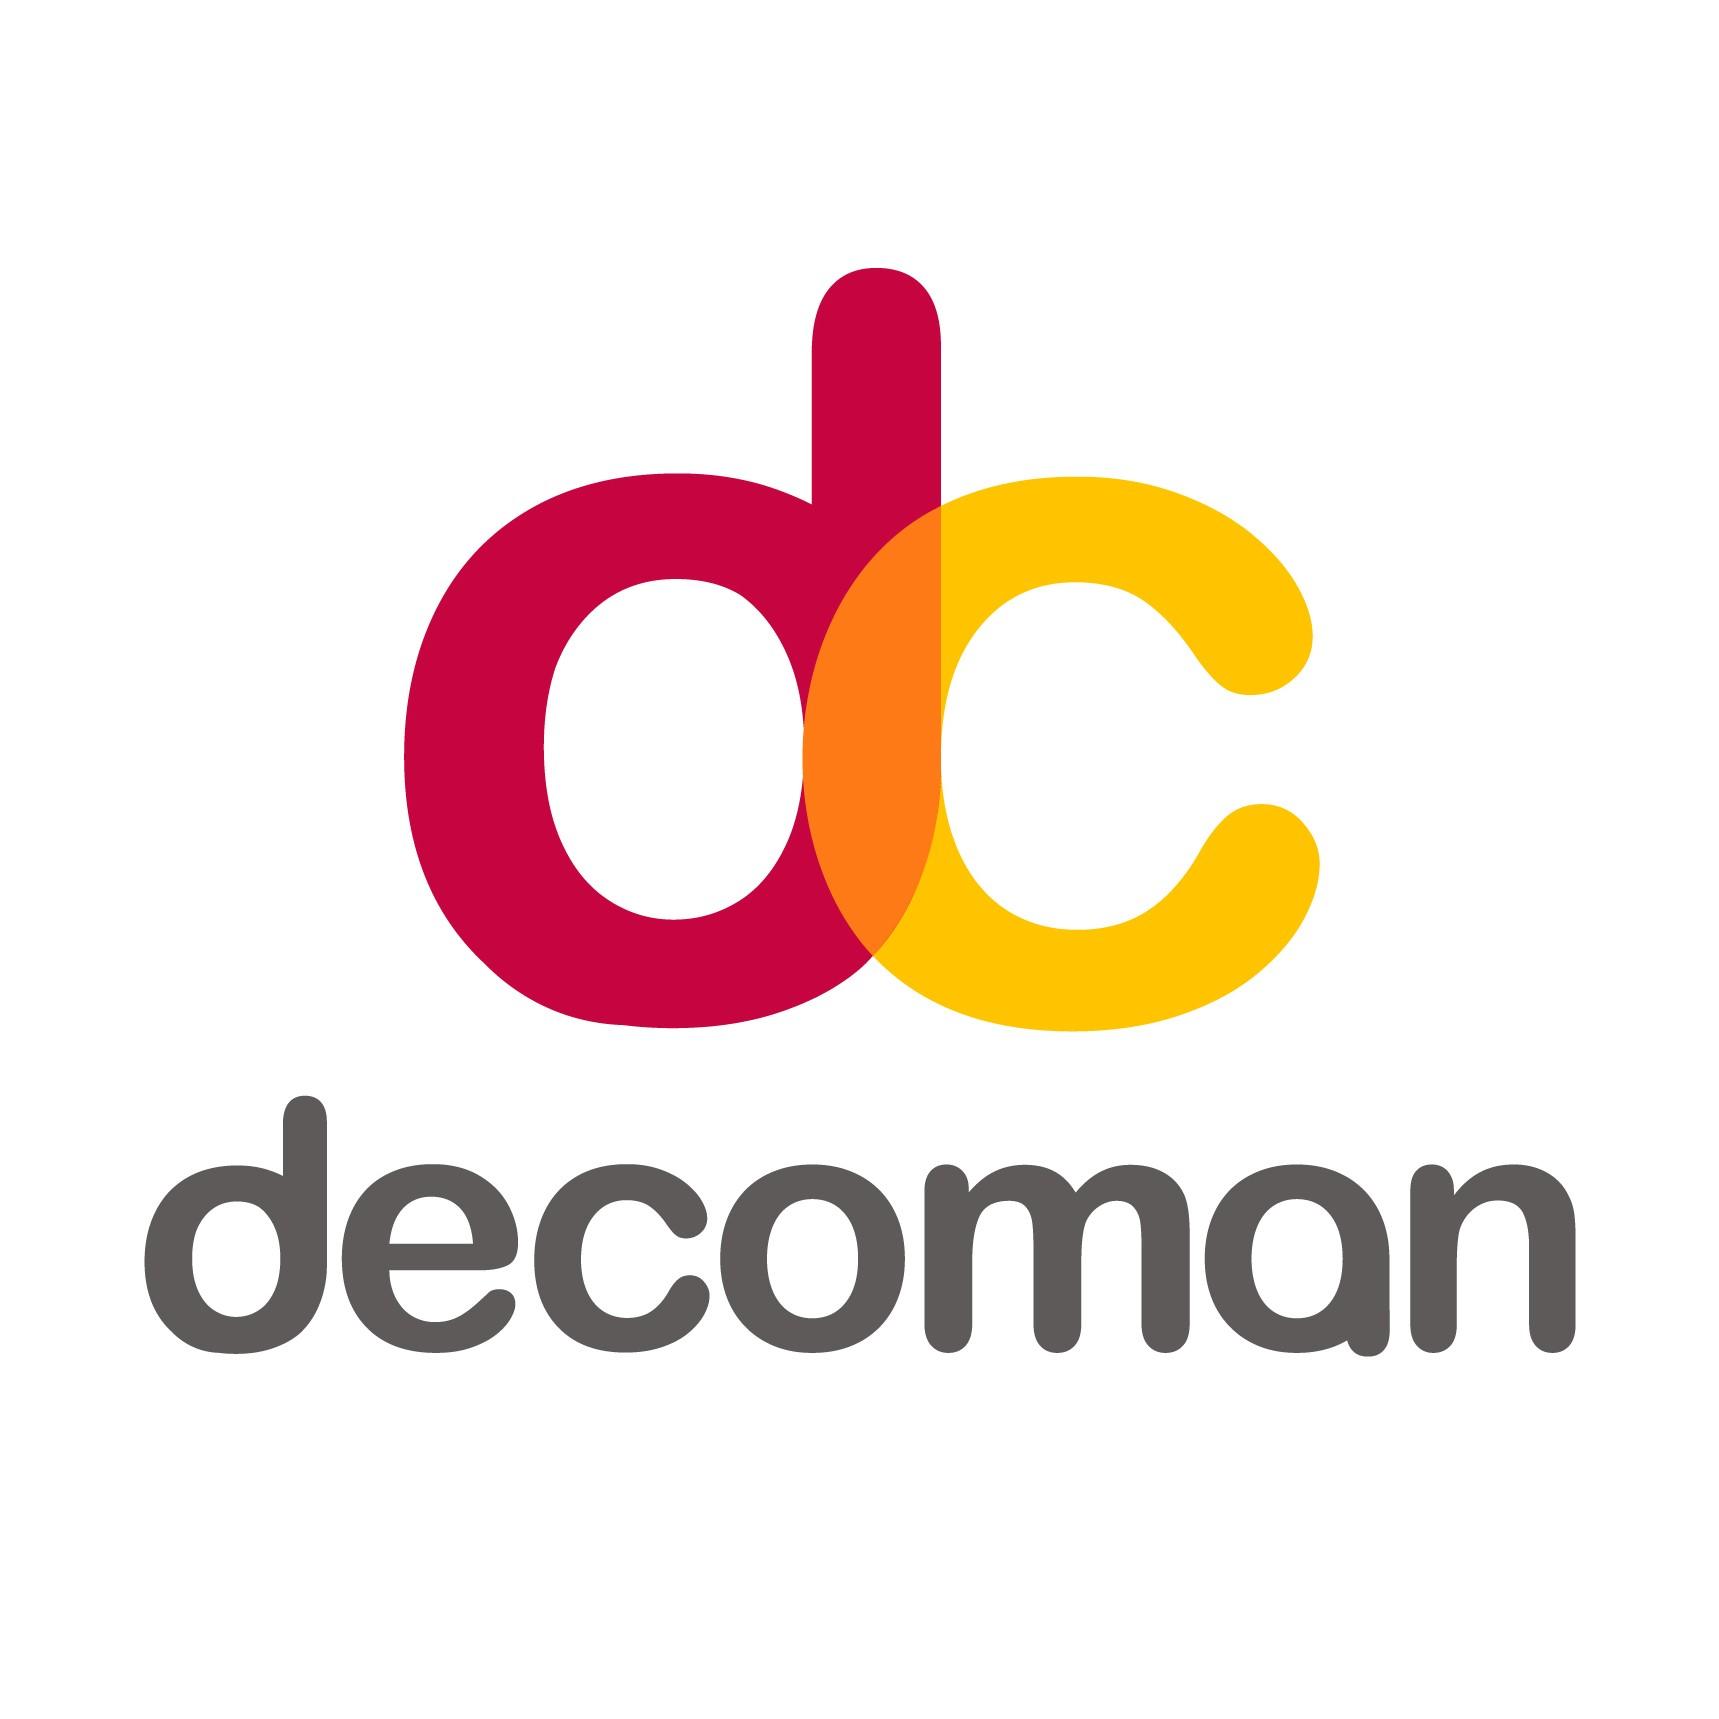 Decoman